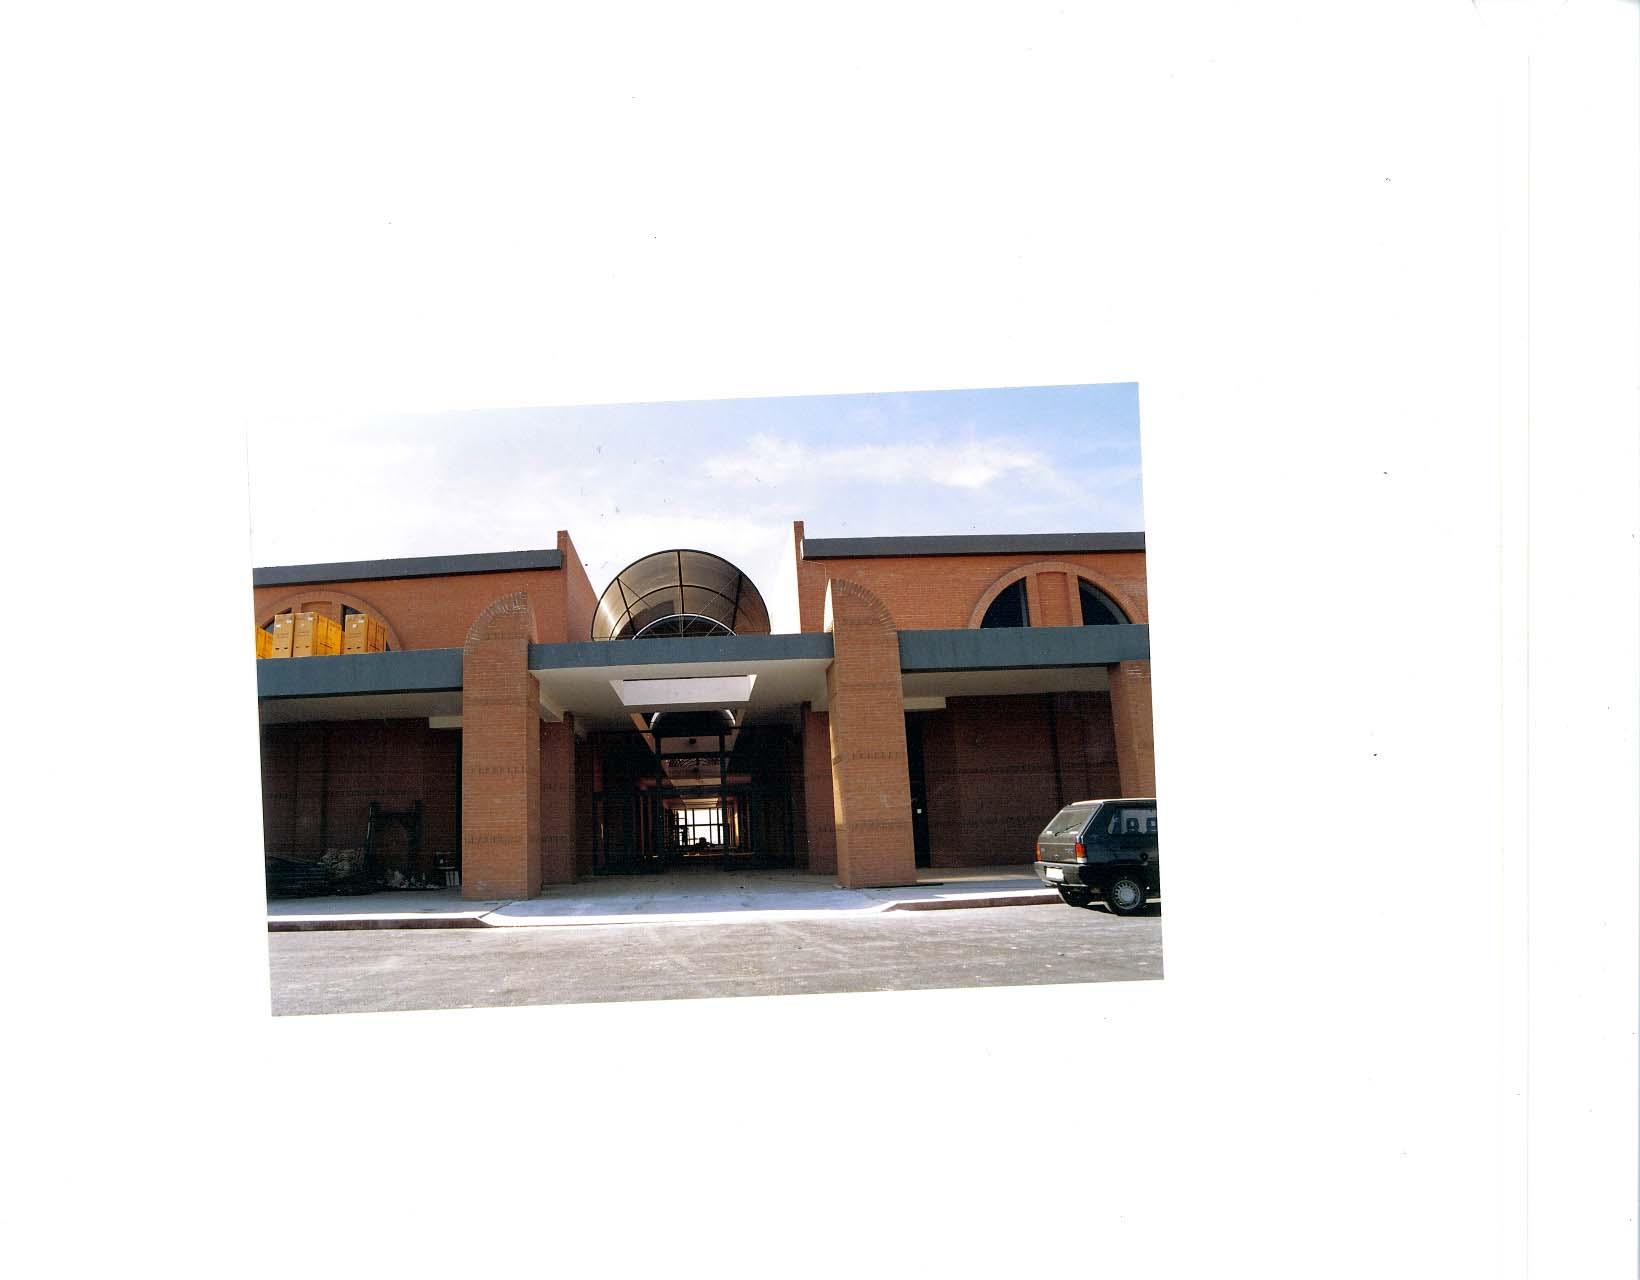 Italy Commercial Center Reno